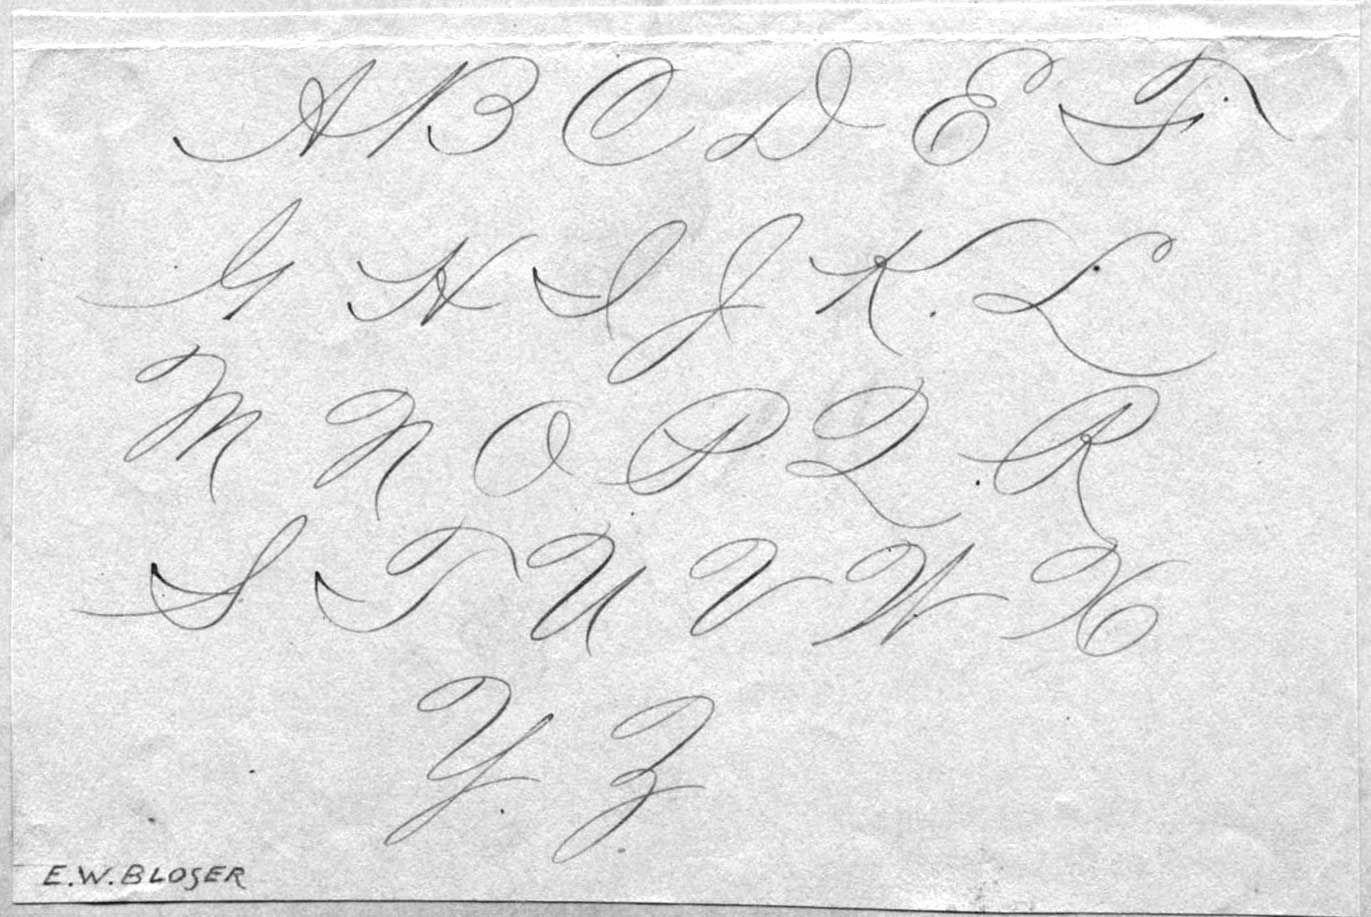 Workbooks zaner bloser cursive worksheets : Lessons - Cursive Handwriting - Palmer Method | Calligraphy ...